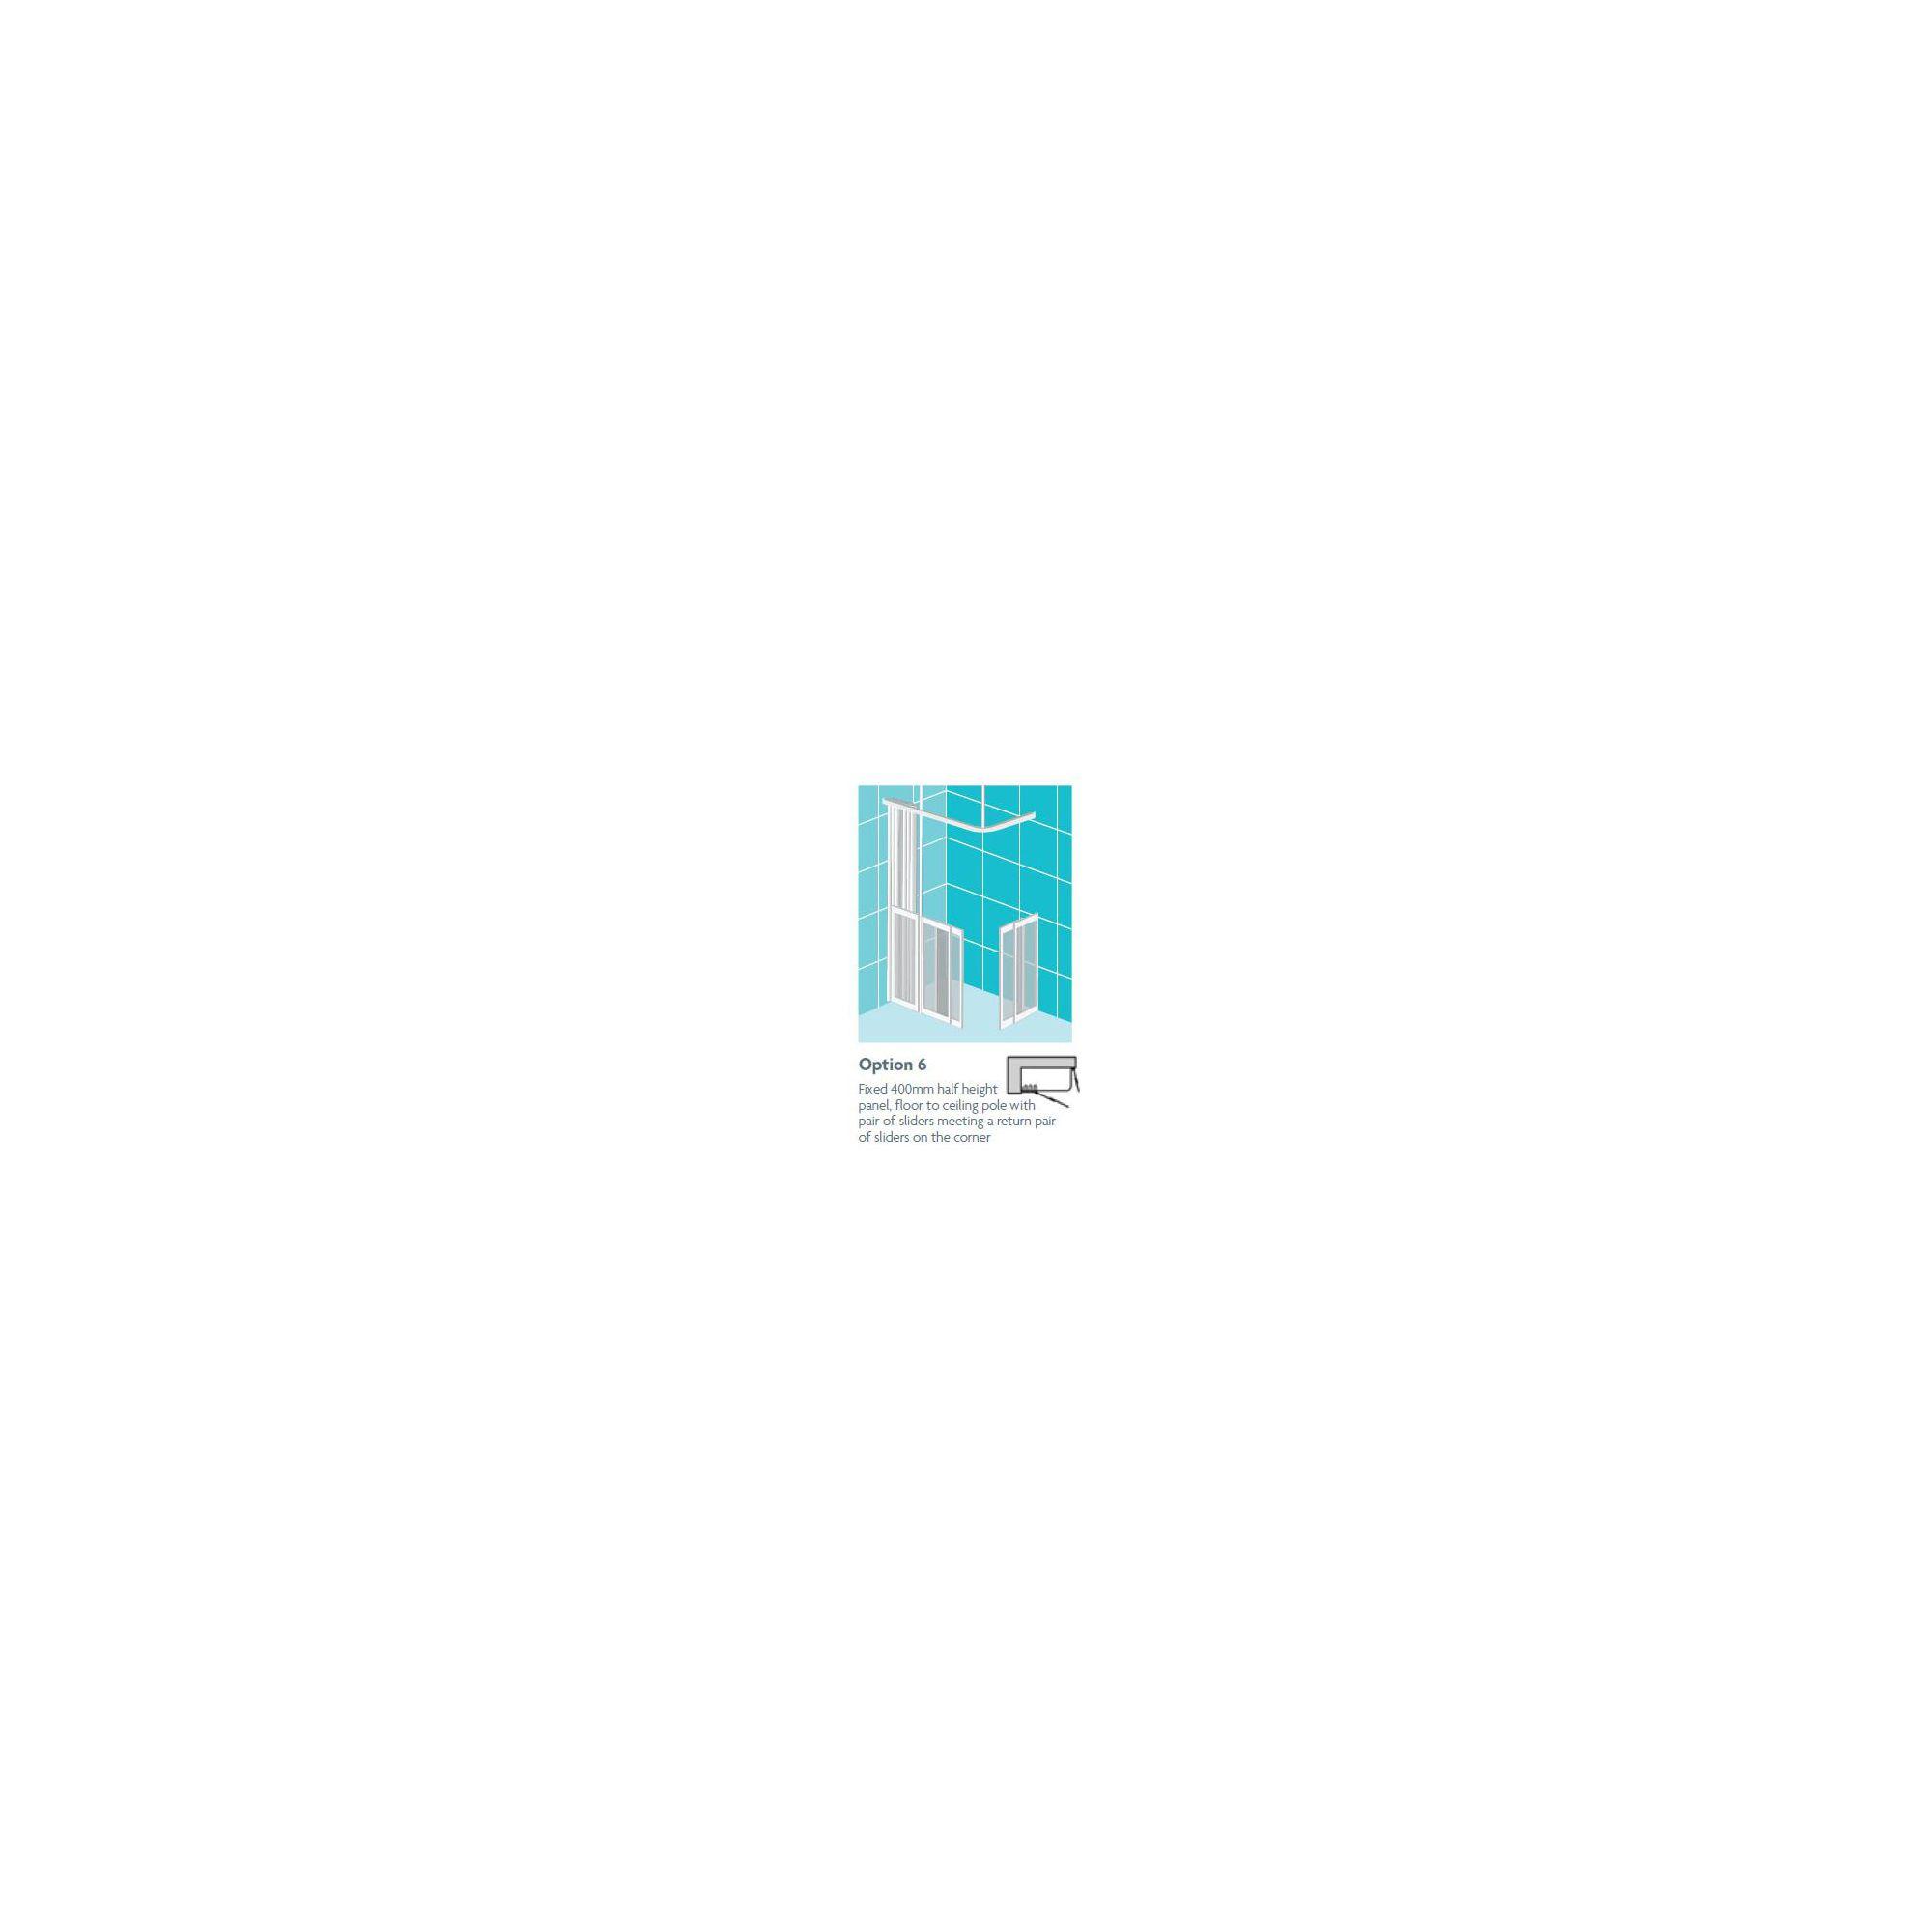 Impey Supreme Corner Door Option 6 Left Hand 1650mm x 750mm at Tescos Direct